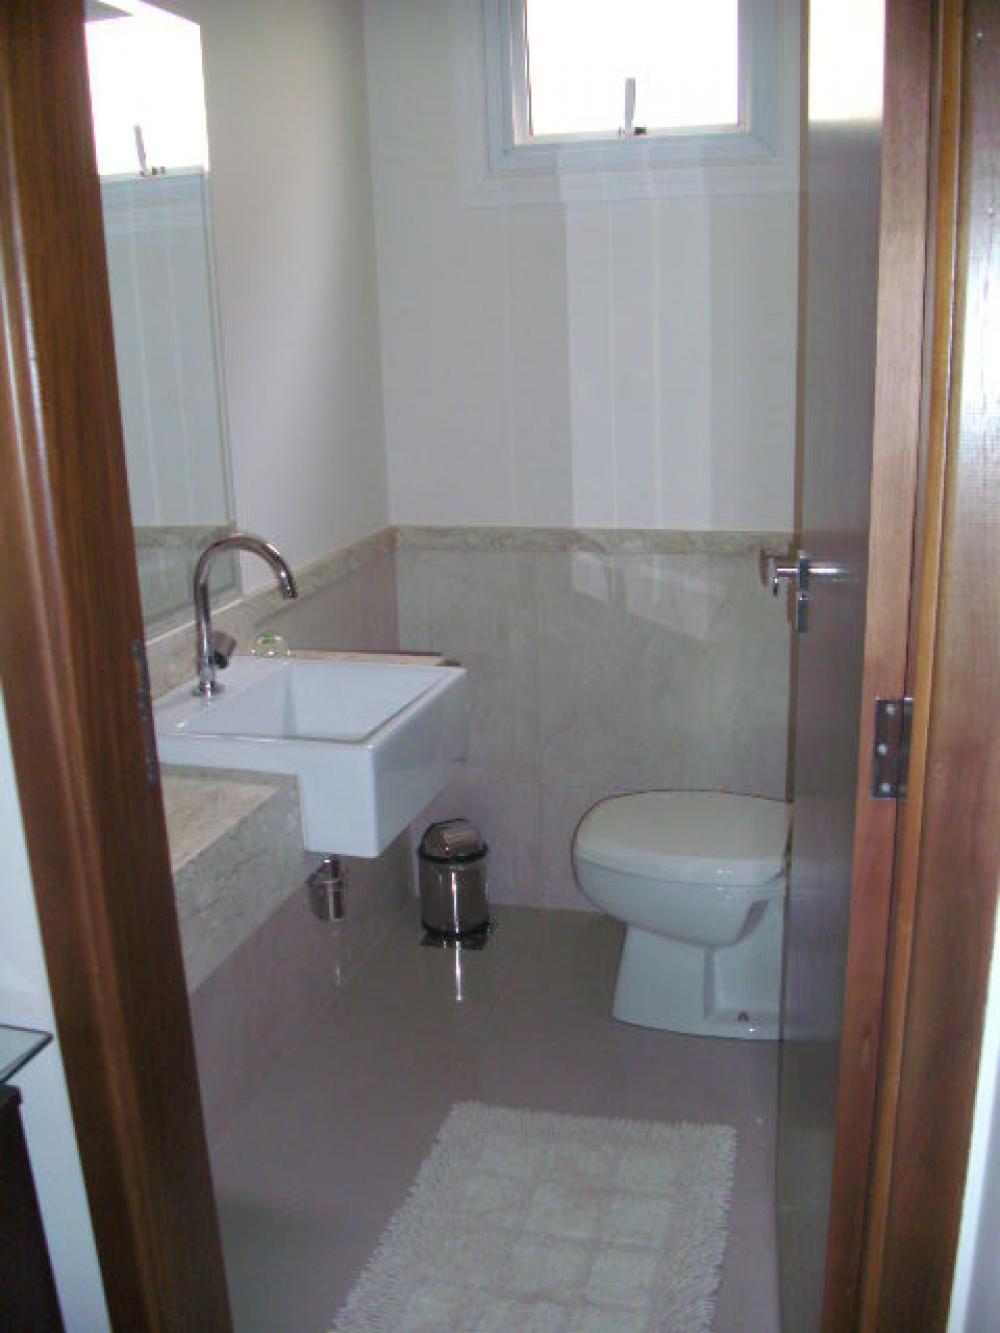 Comprar Casa / Condomínio em Mirassol R$ 750.000,00 - Foto 19